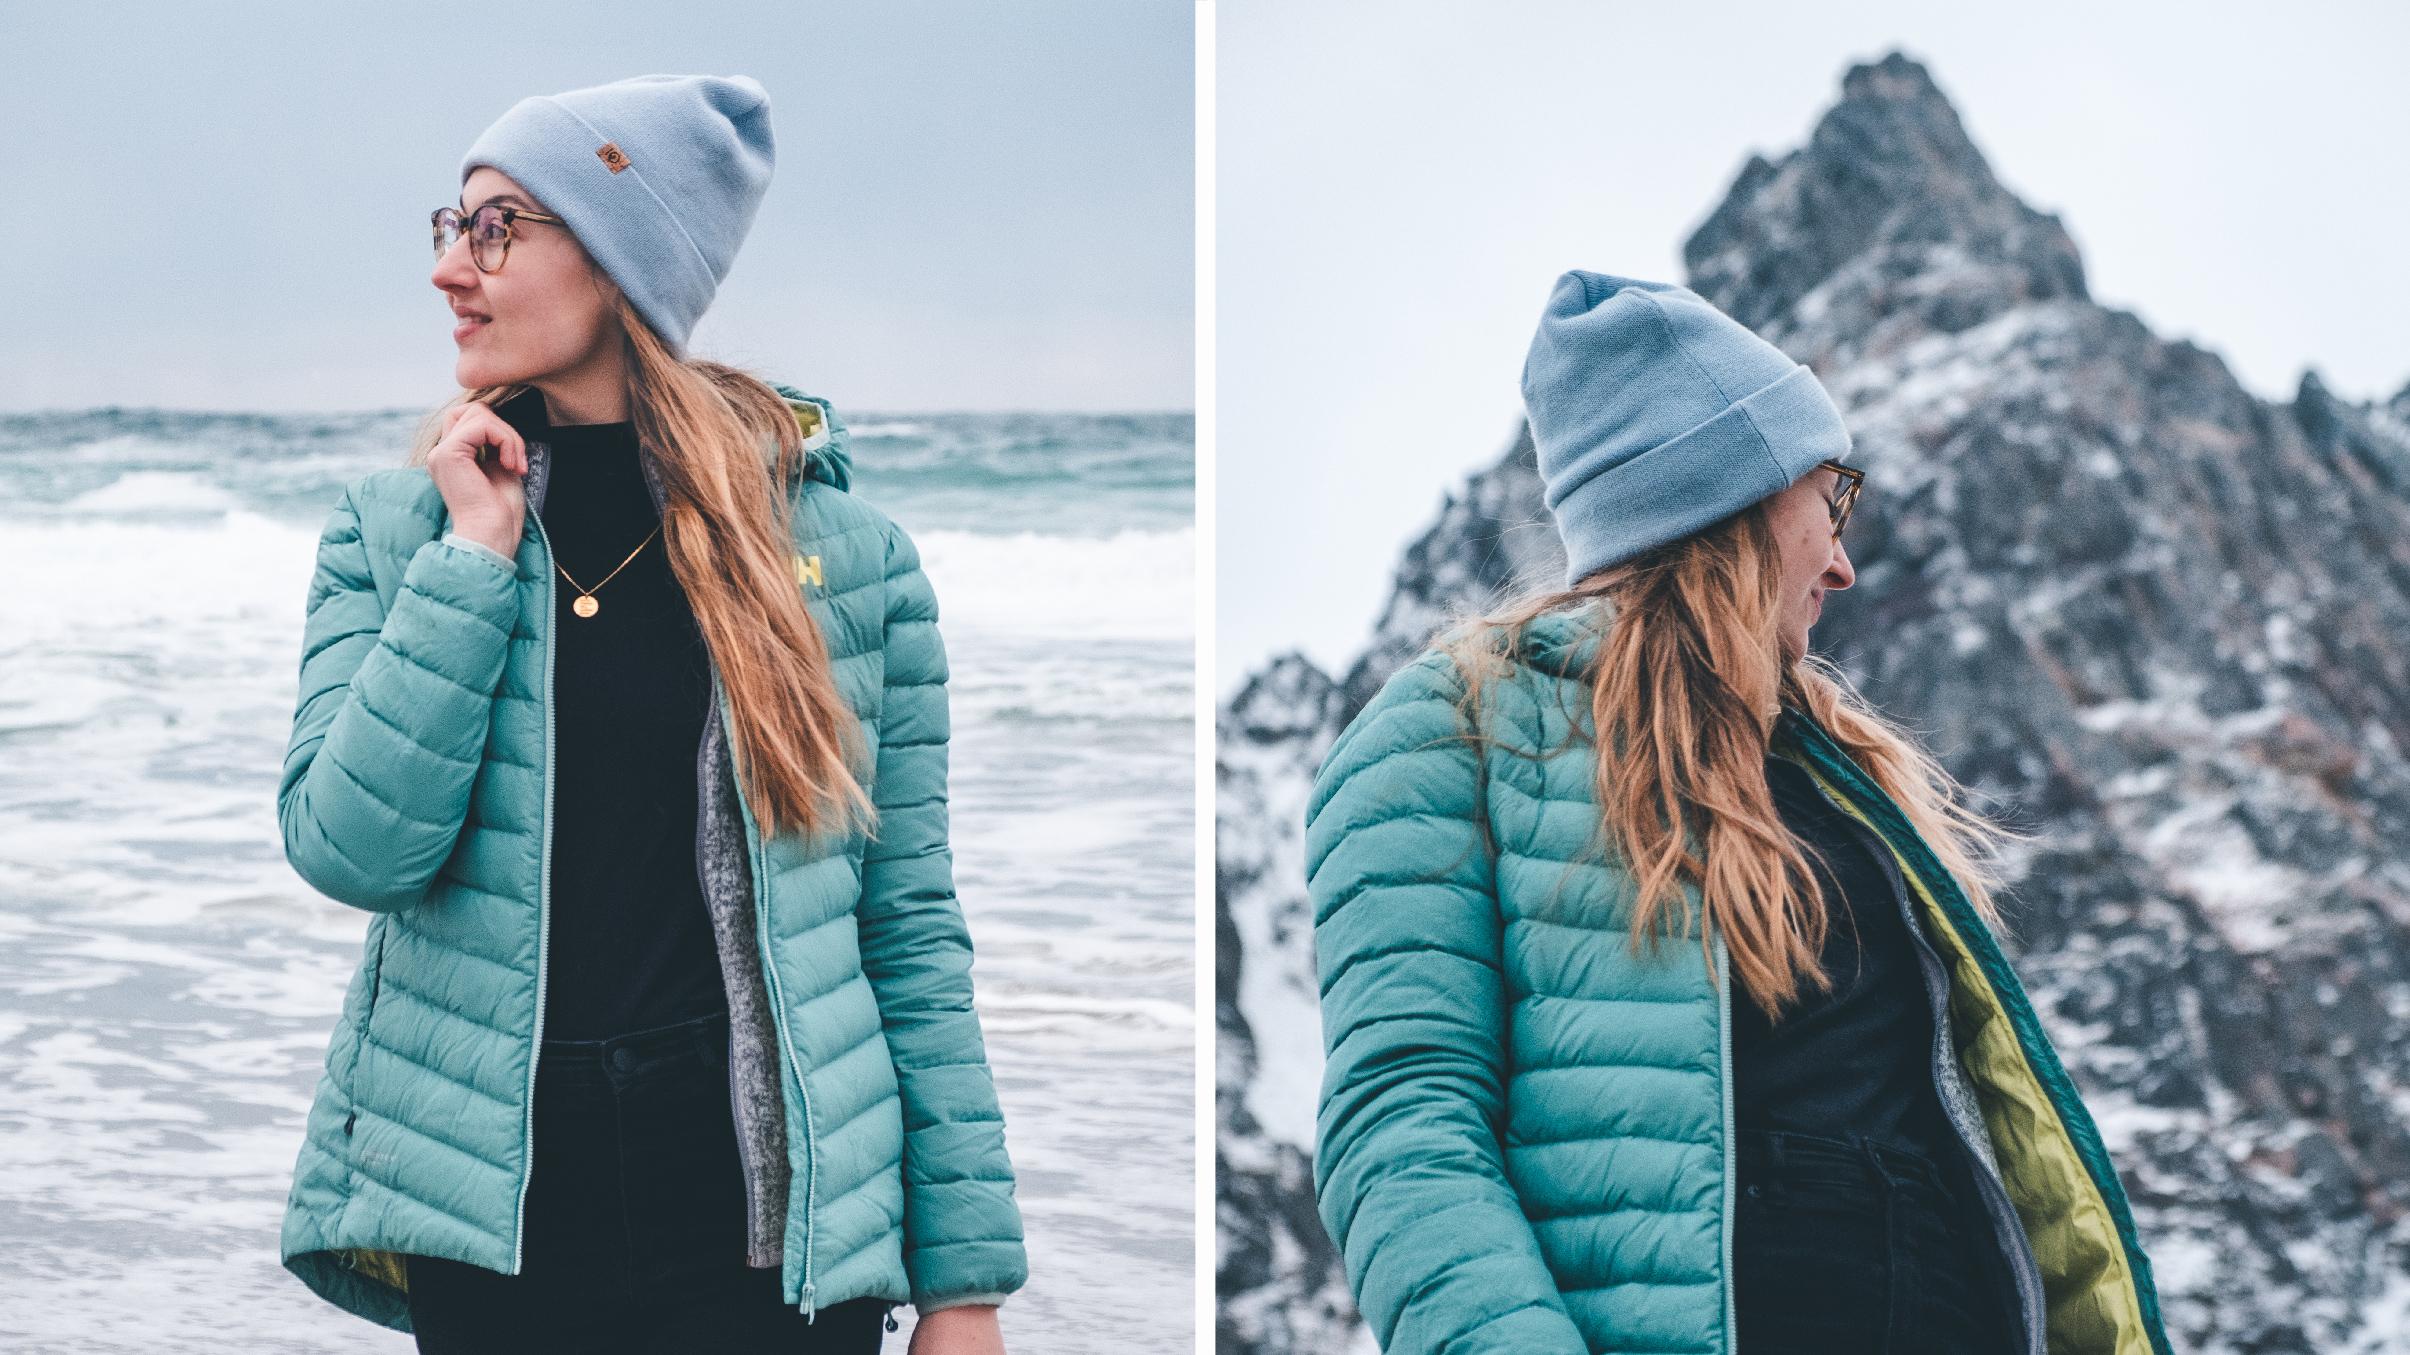 Wintercamping Ausrüstung - Organic Basics| © Boardshortslife